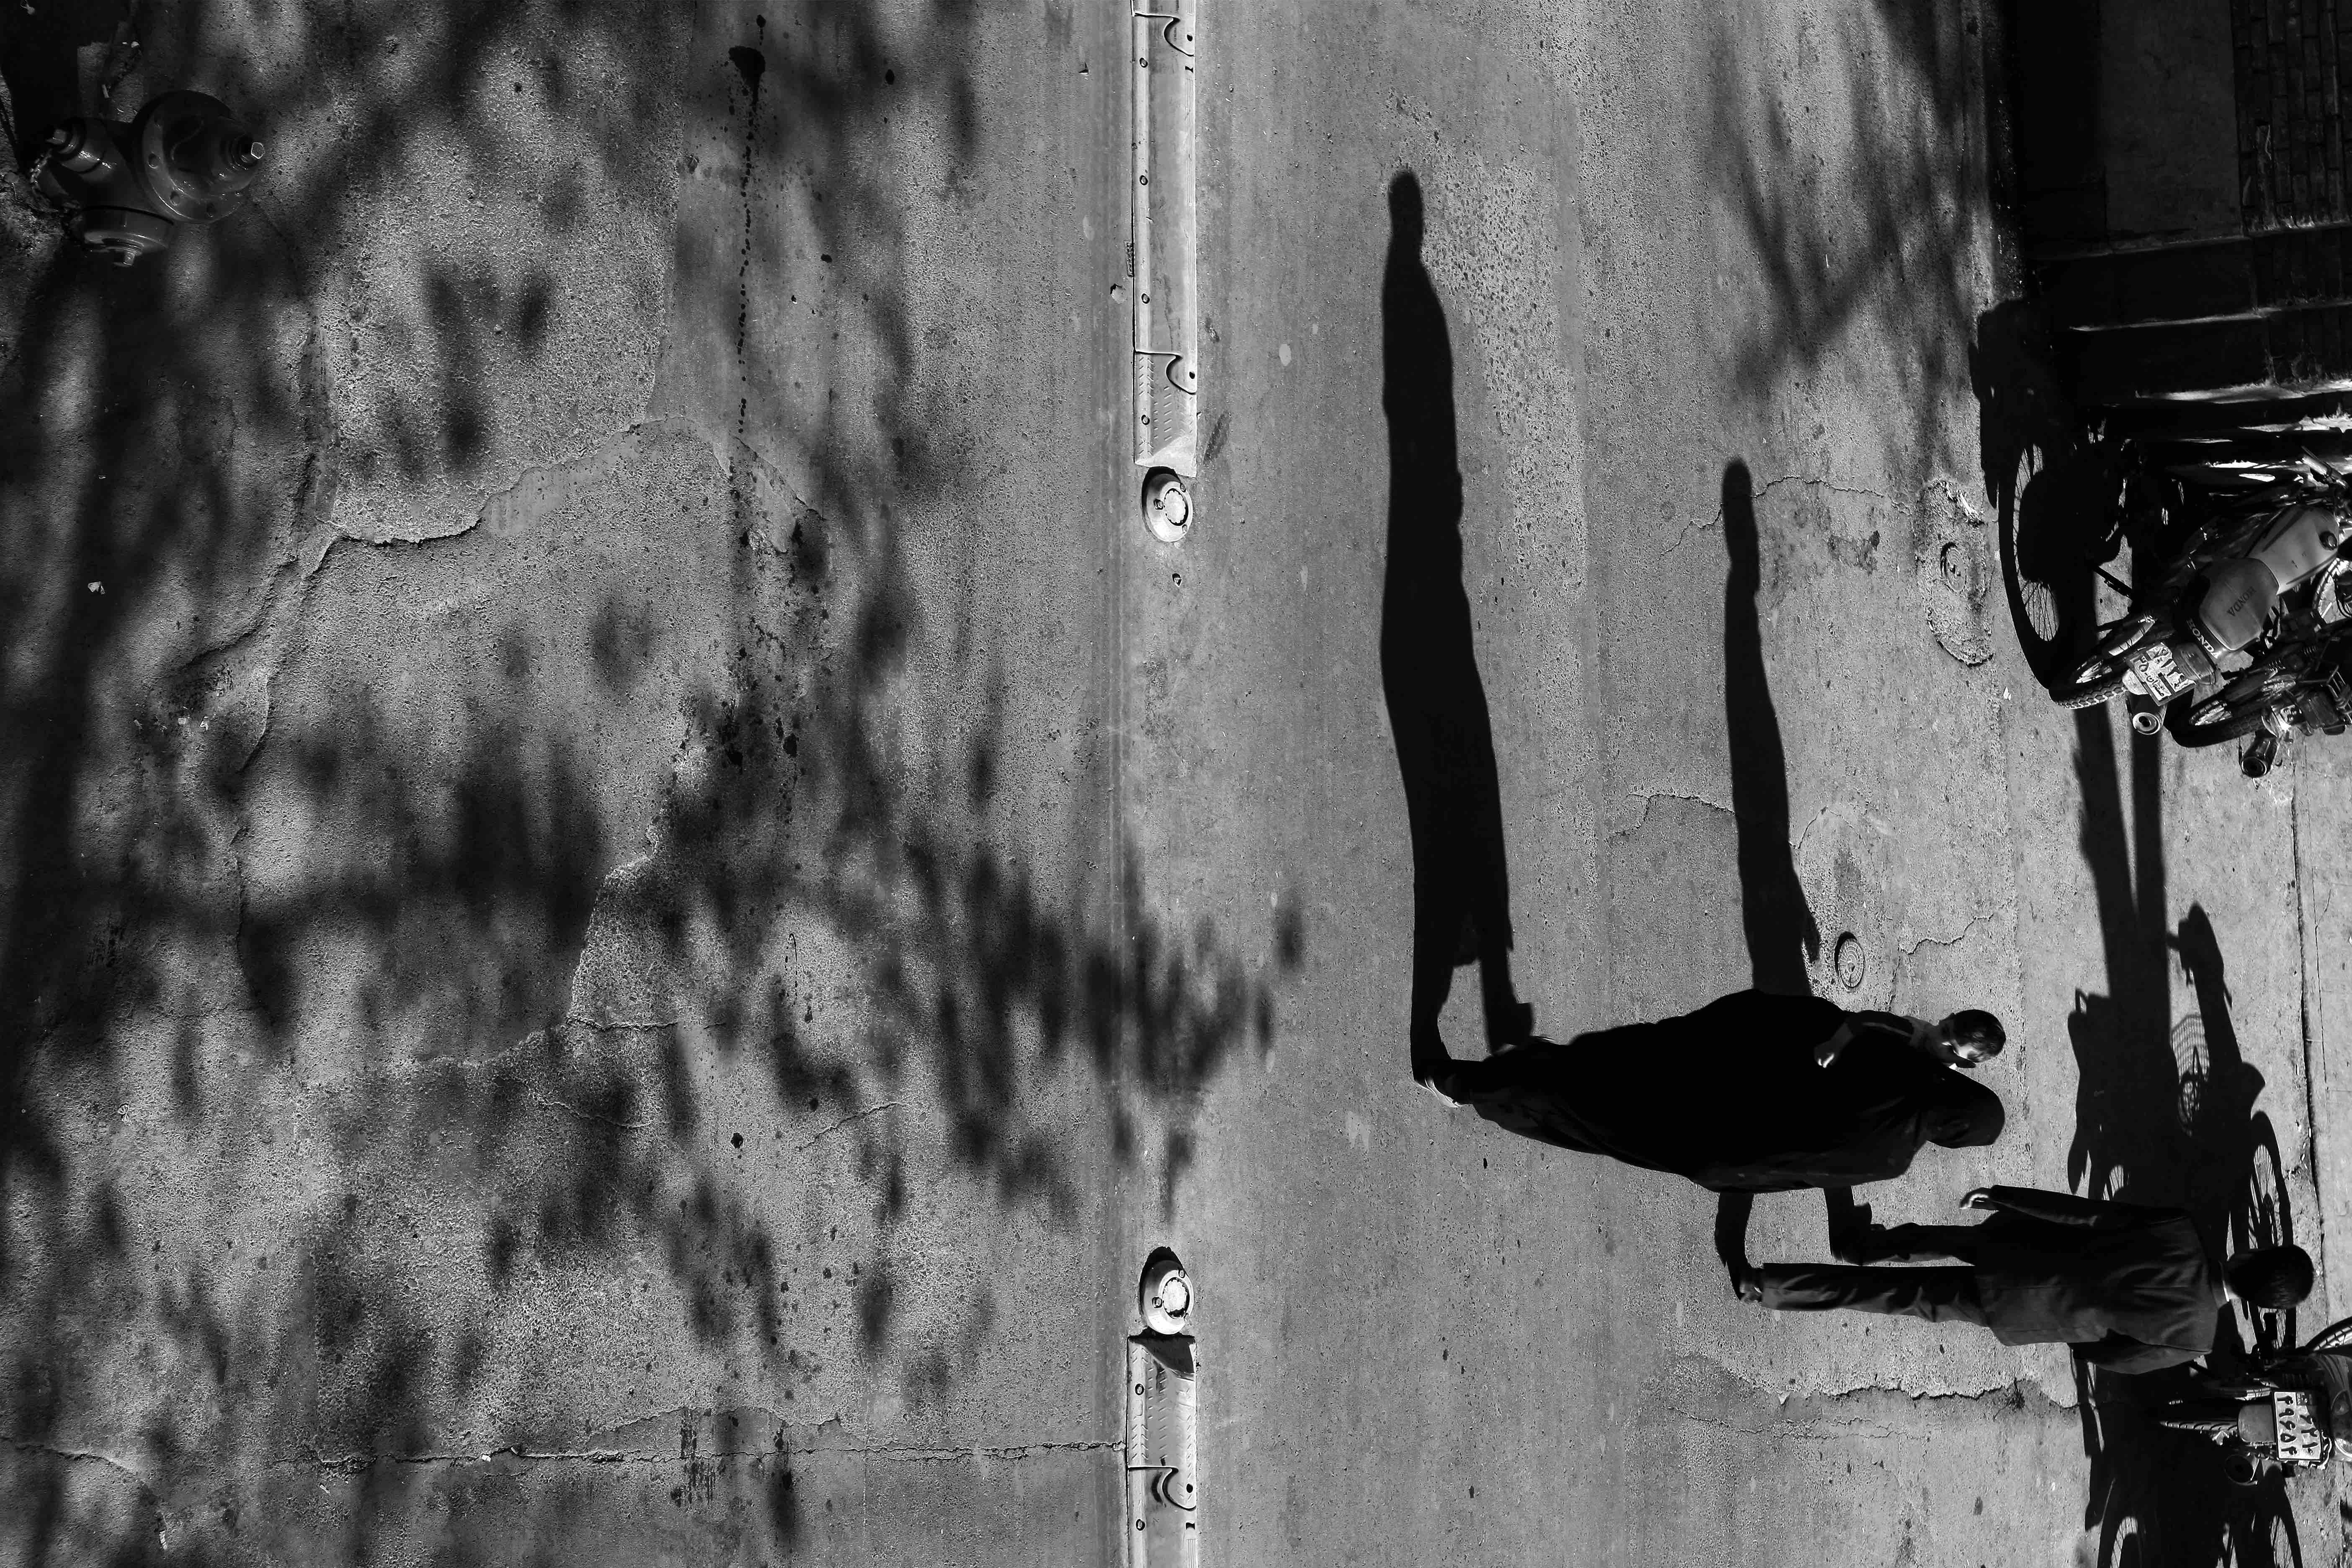 Untitled (13)_ The Life Of Shadows Series - Nehdaran_ Dana